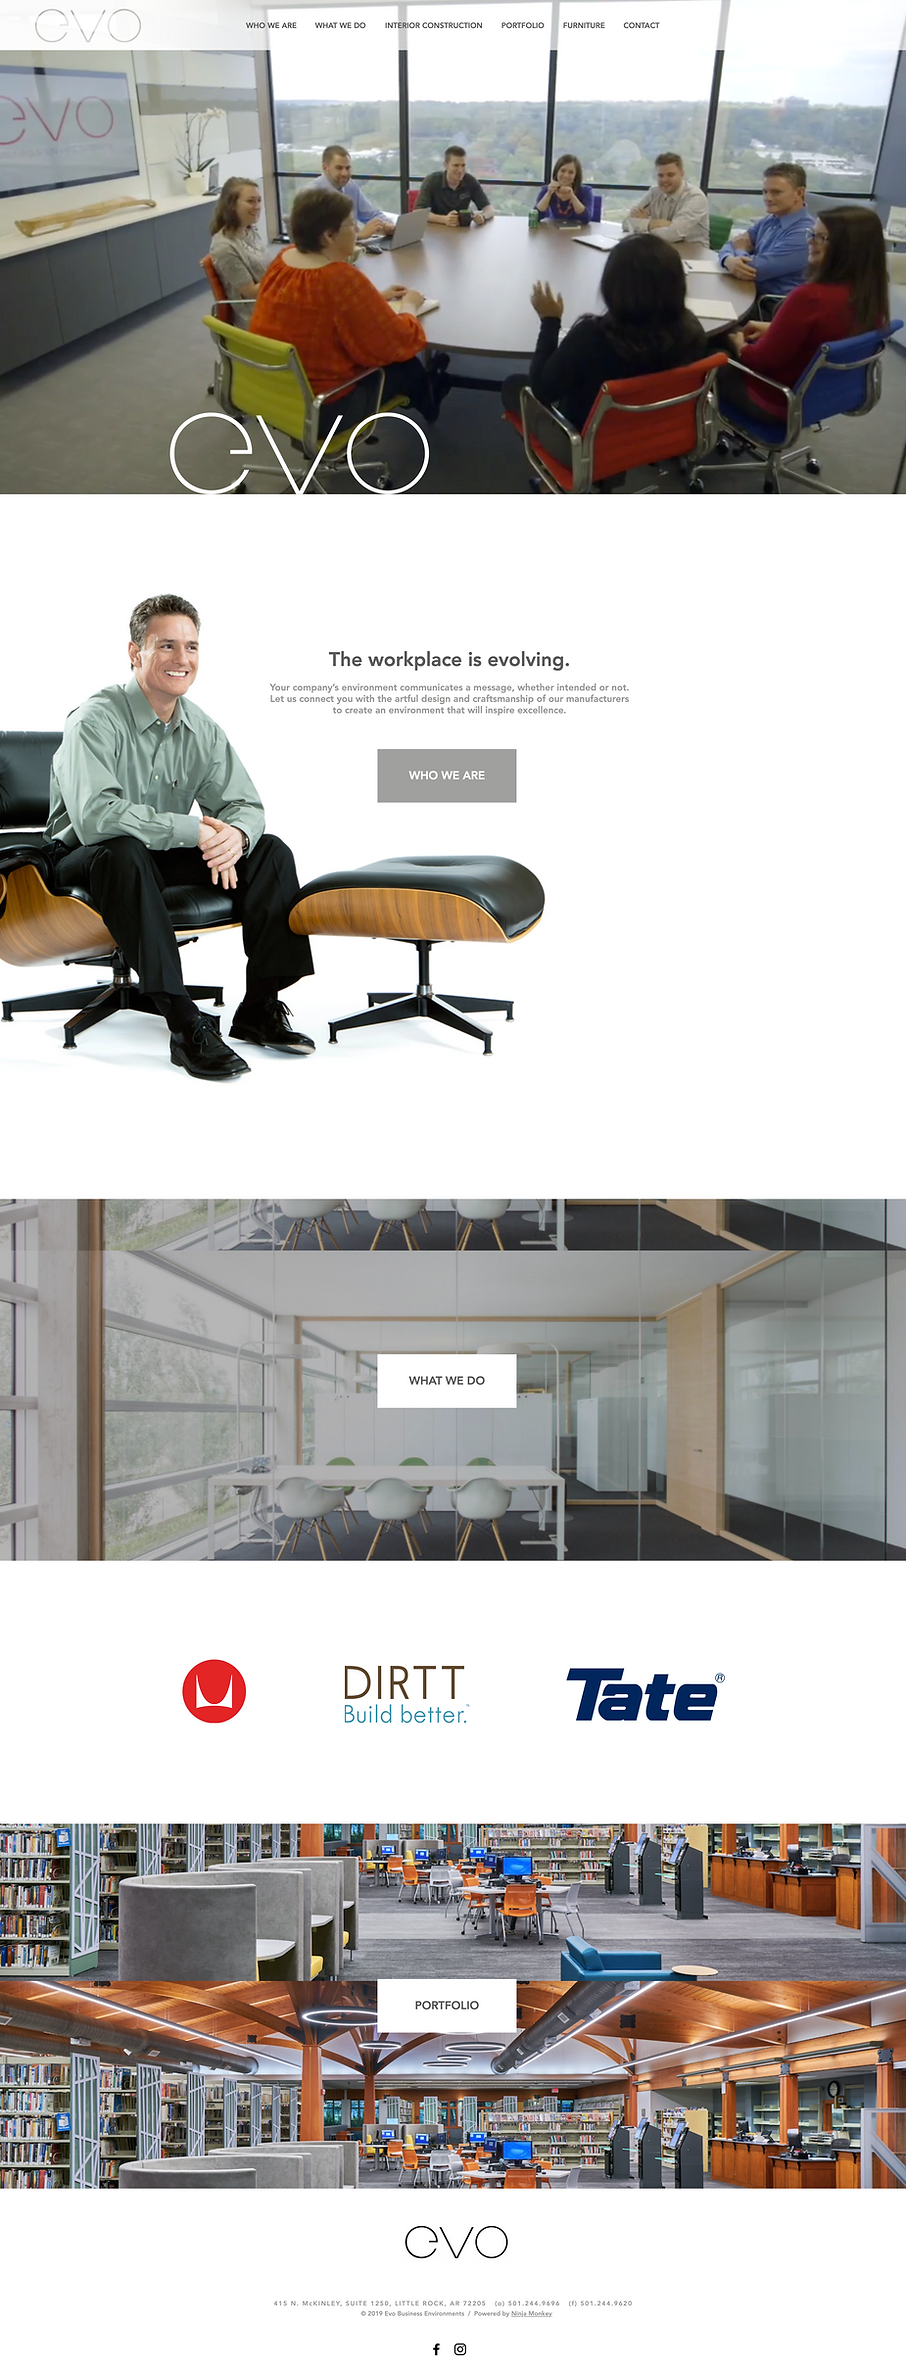 Ninja Monkey - Web Design & Marketing